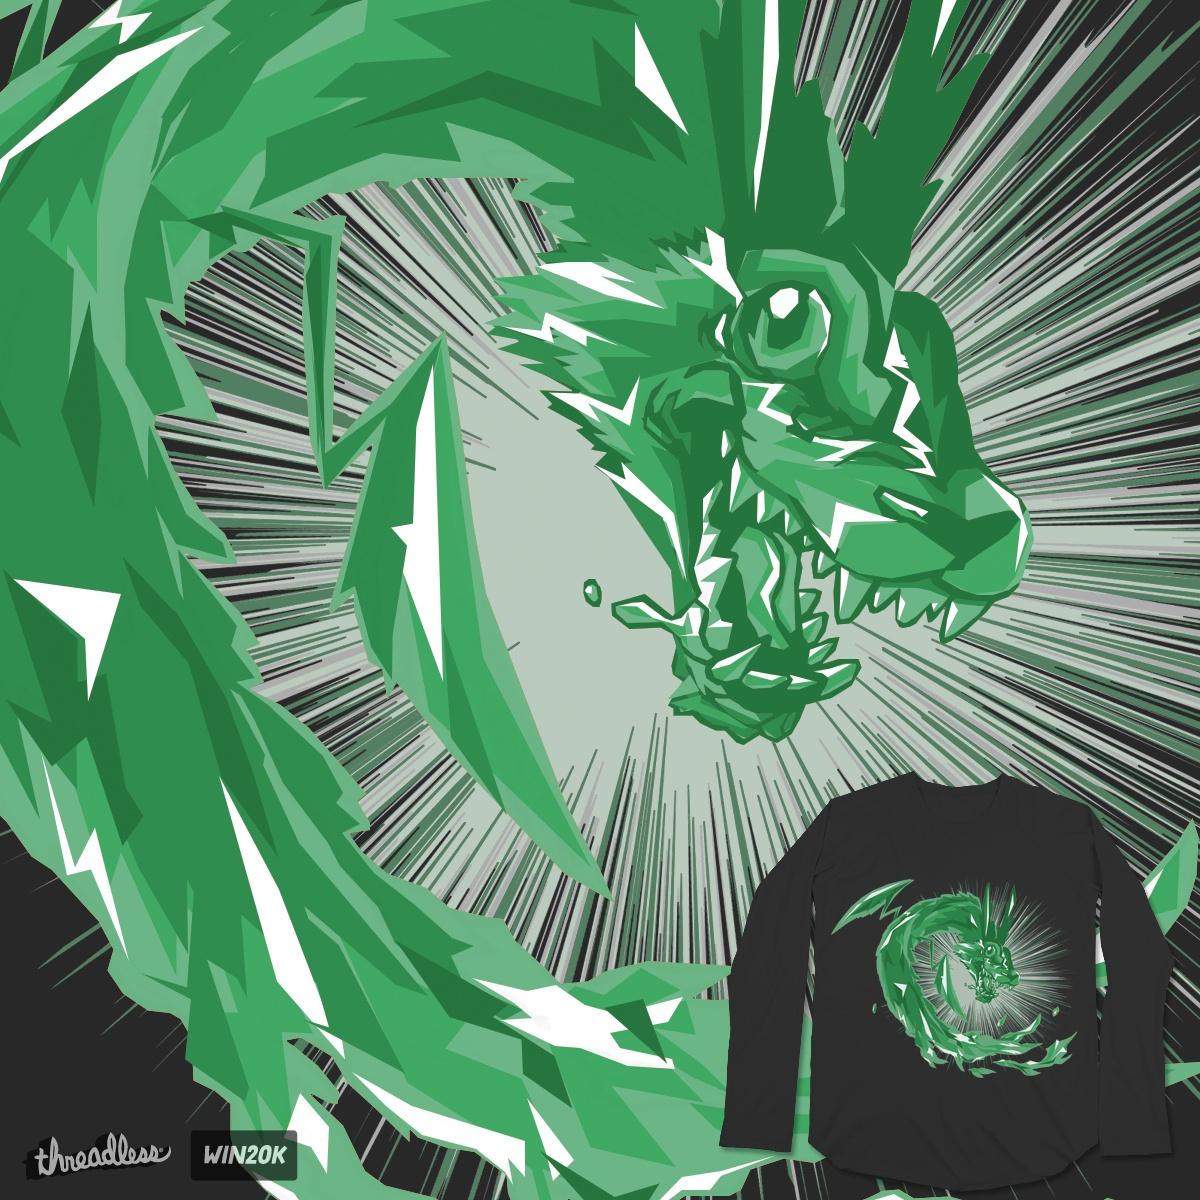 Soul of Jade Dragoon by frikkinmunki on Threadless